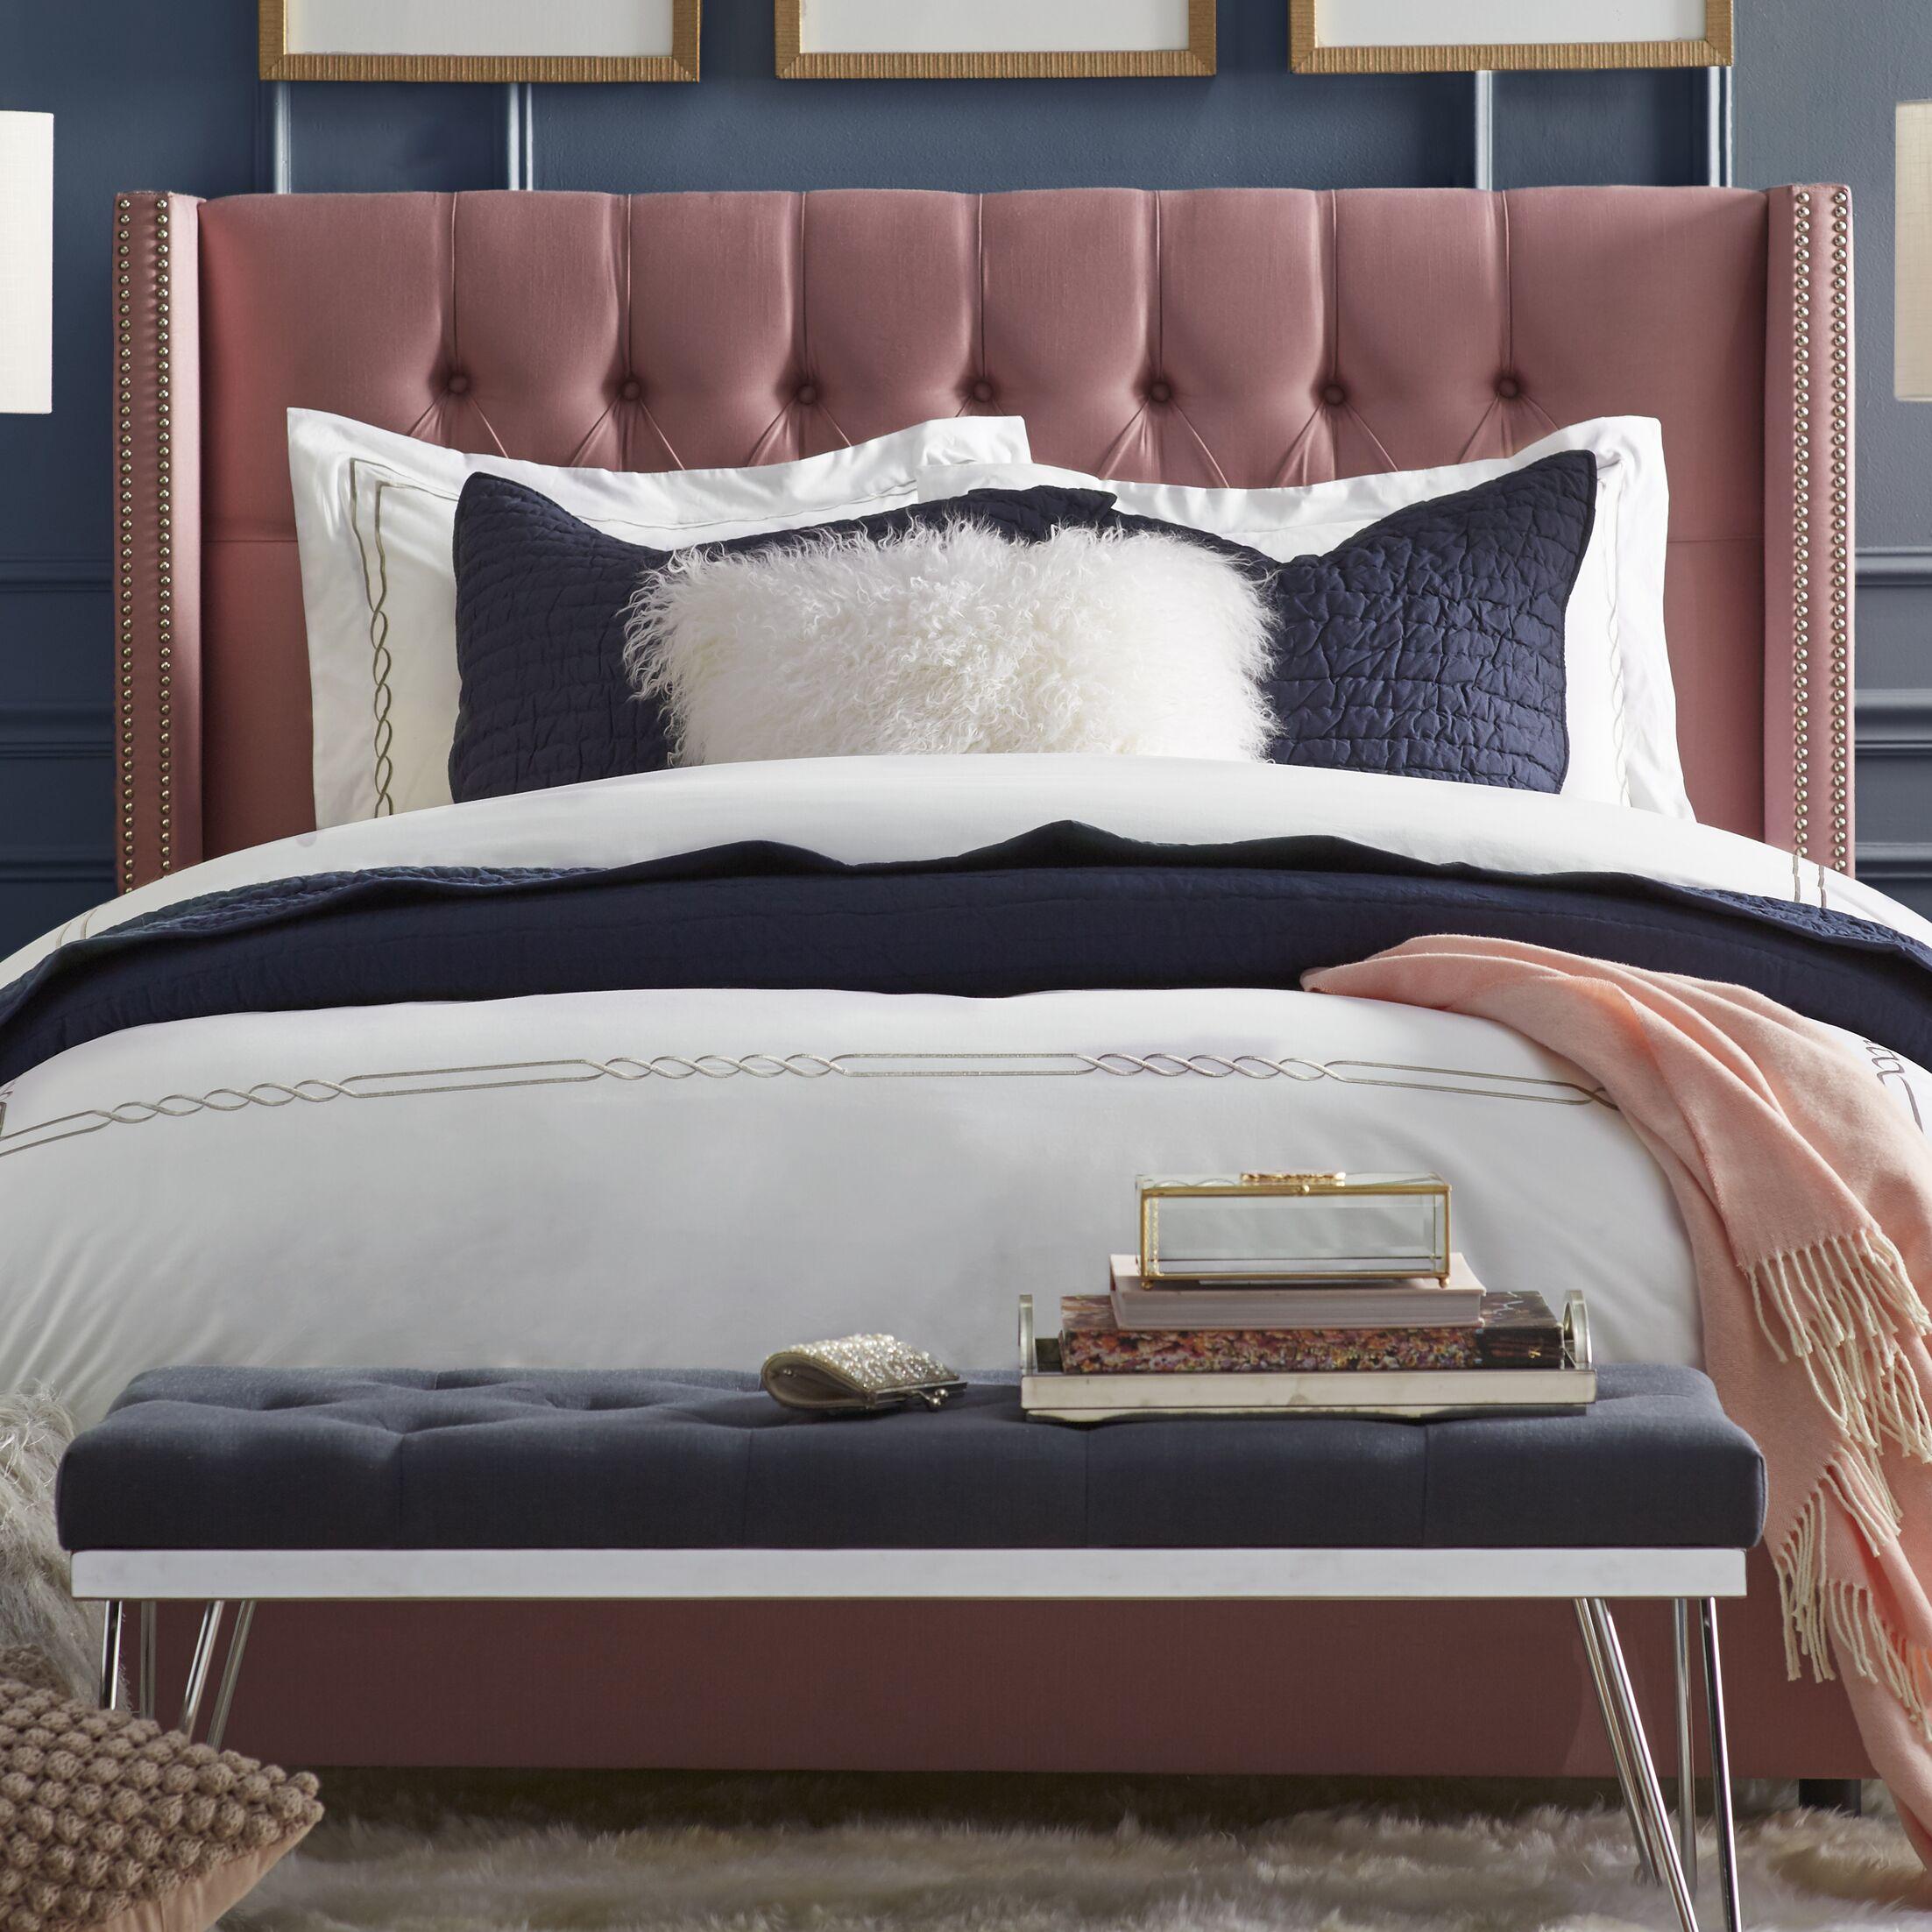 Gerrald Upholstered Panel Bed Color: Regal Dusty Rose, Size: Full